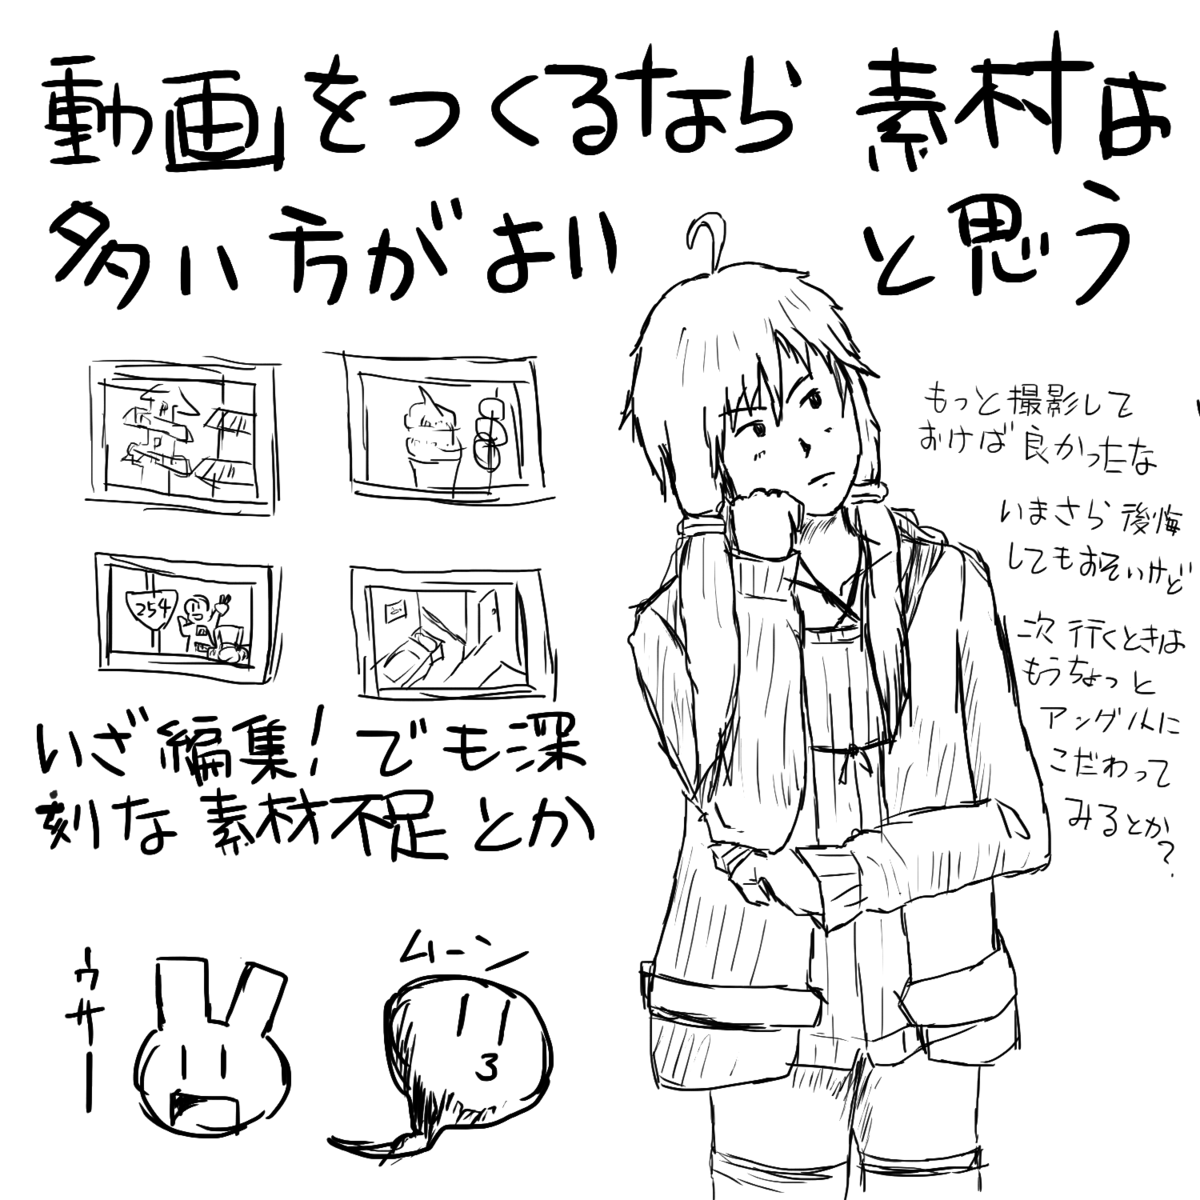 f:id:zomuzomu:20191205152539p:plain